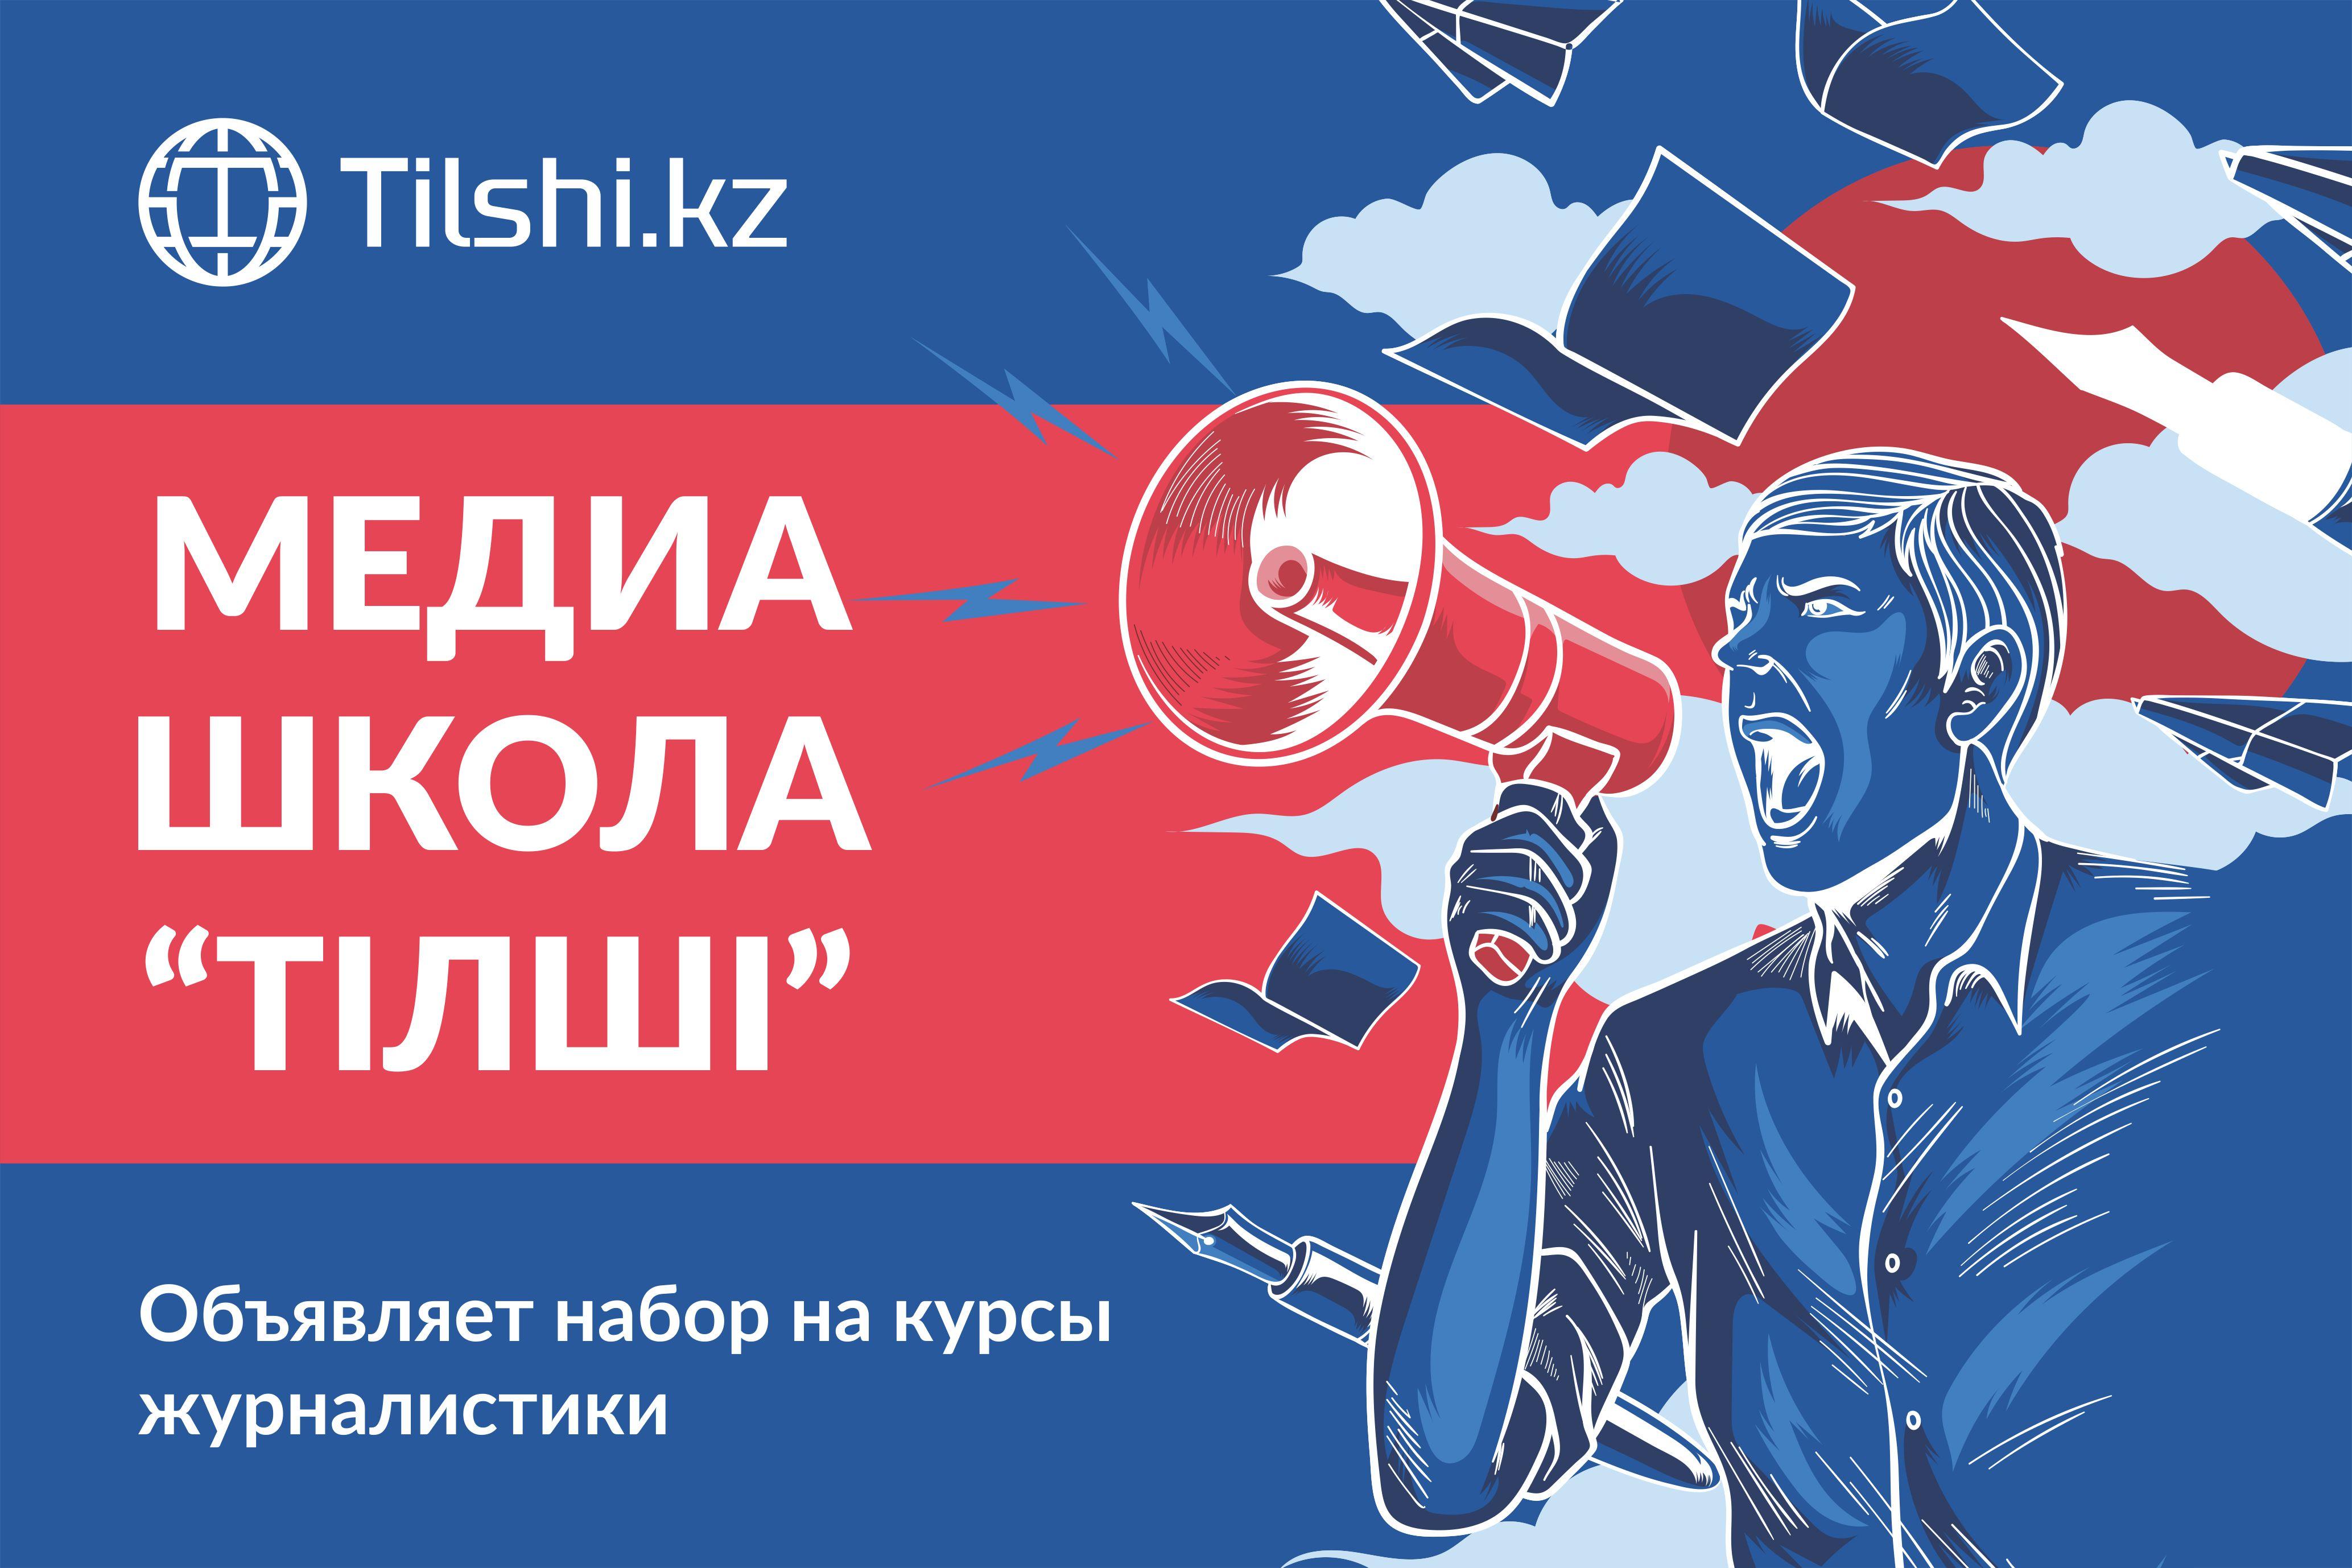 media_school_tilshi_1